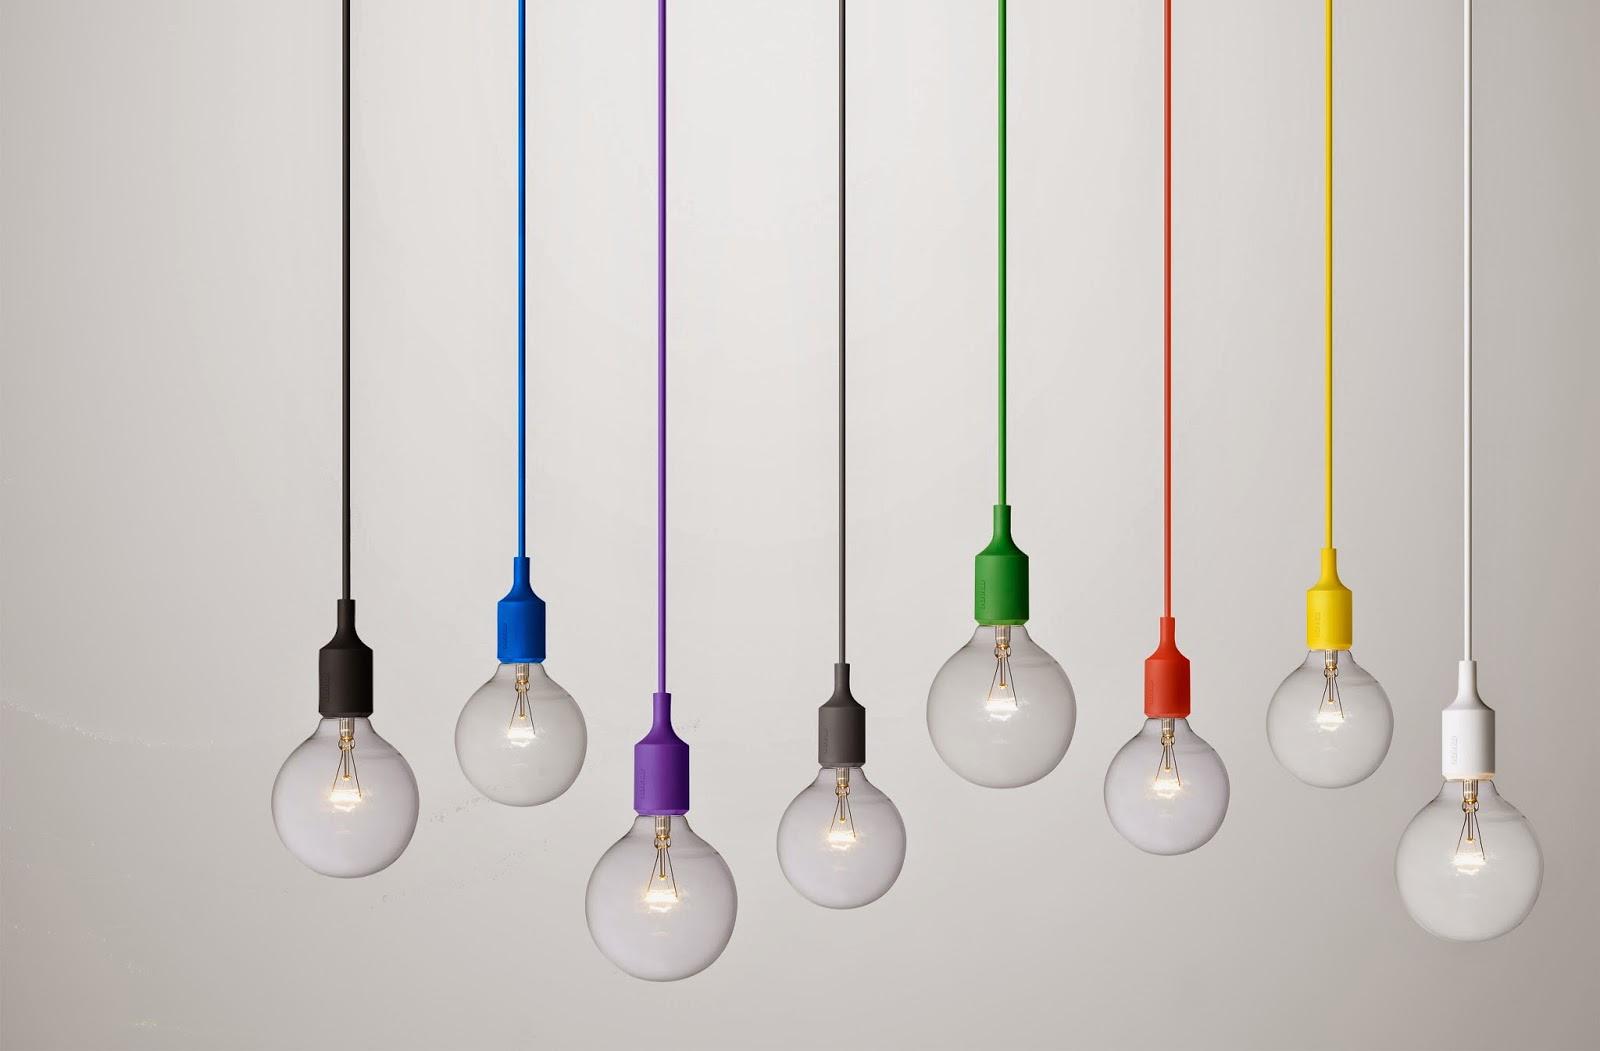 Lampade A Sospensione Ikea : Lampada a sospensione ikea melodi: lampade da comodino ikea fresco